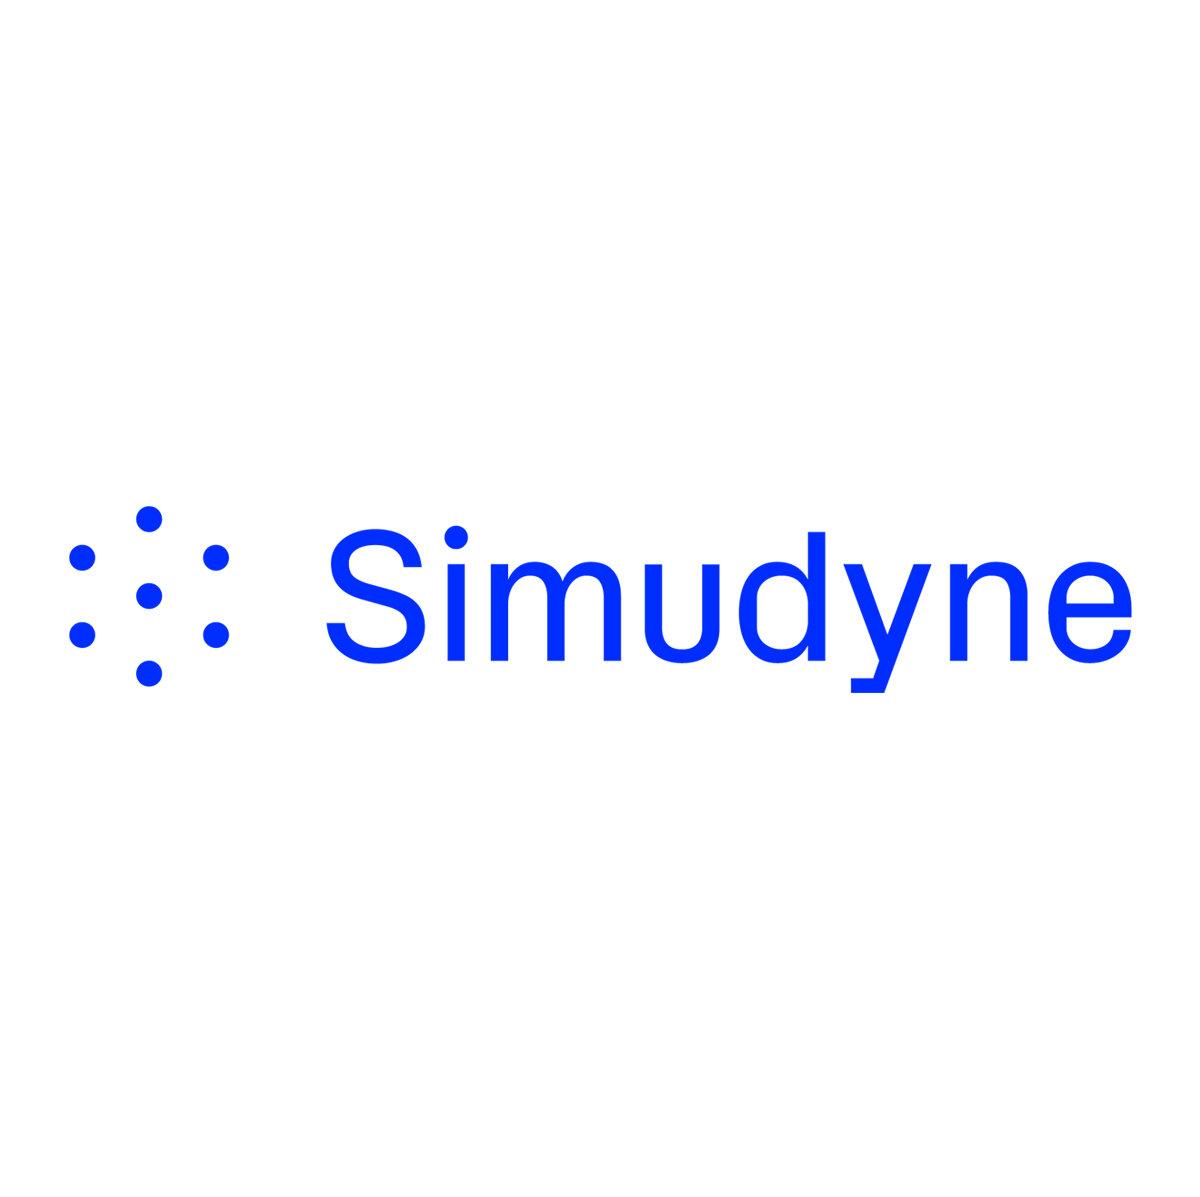 FT50 square simudyne.jpg